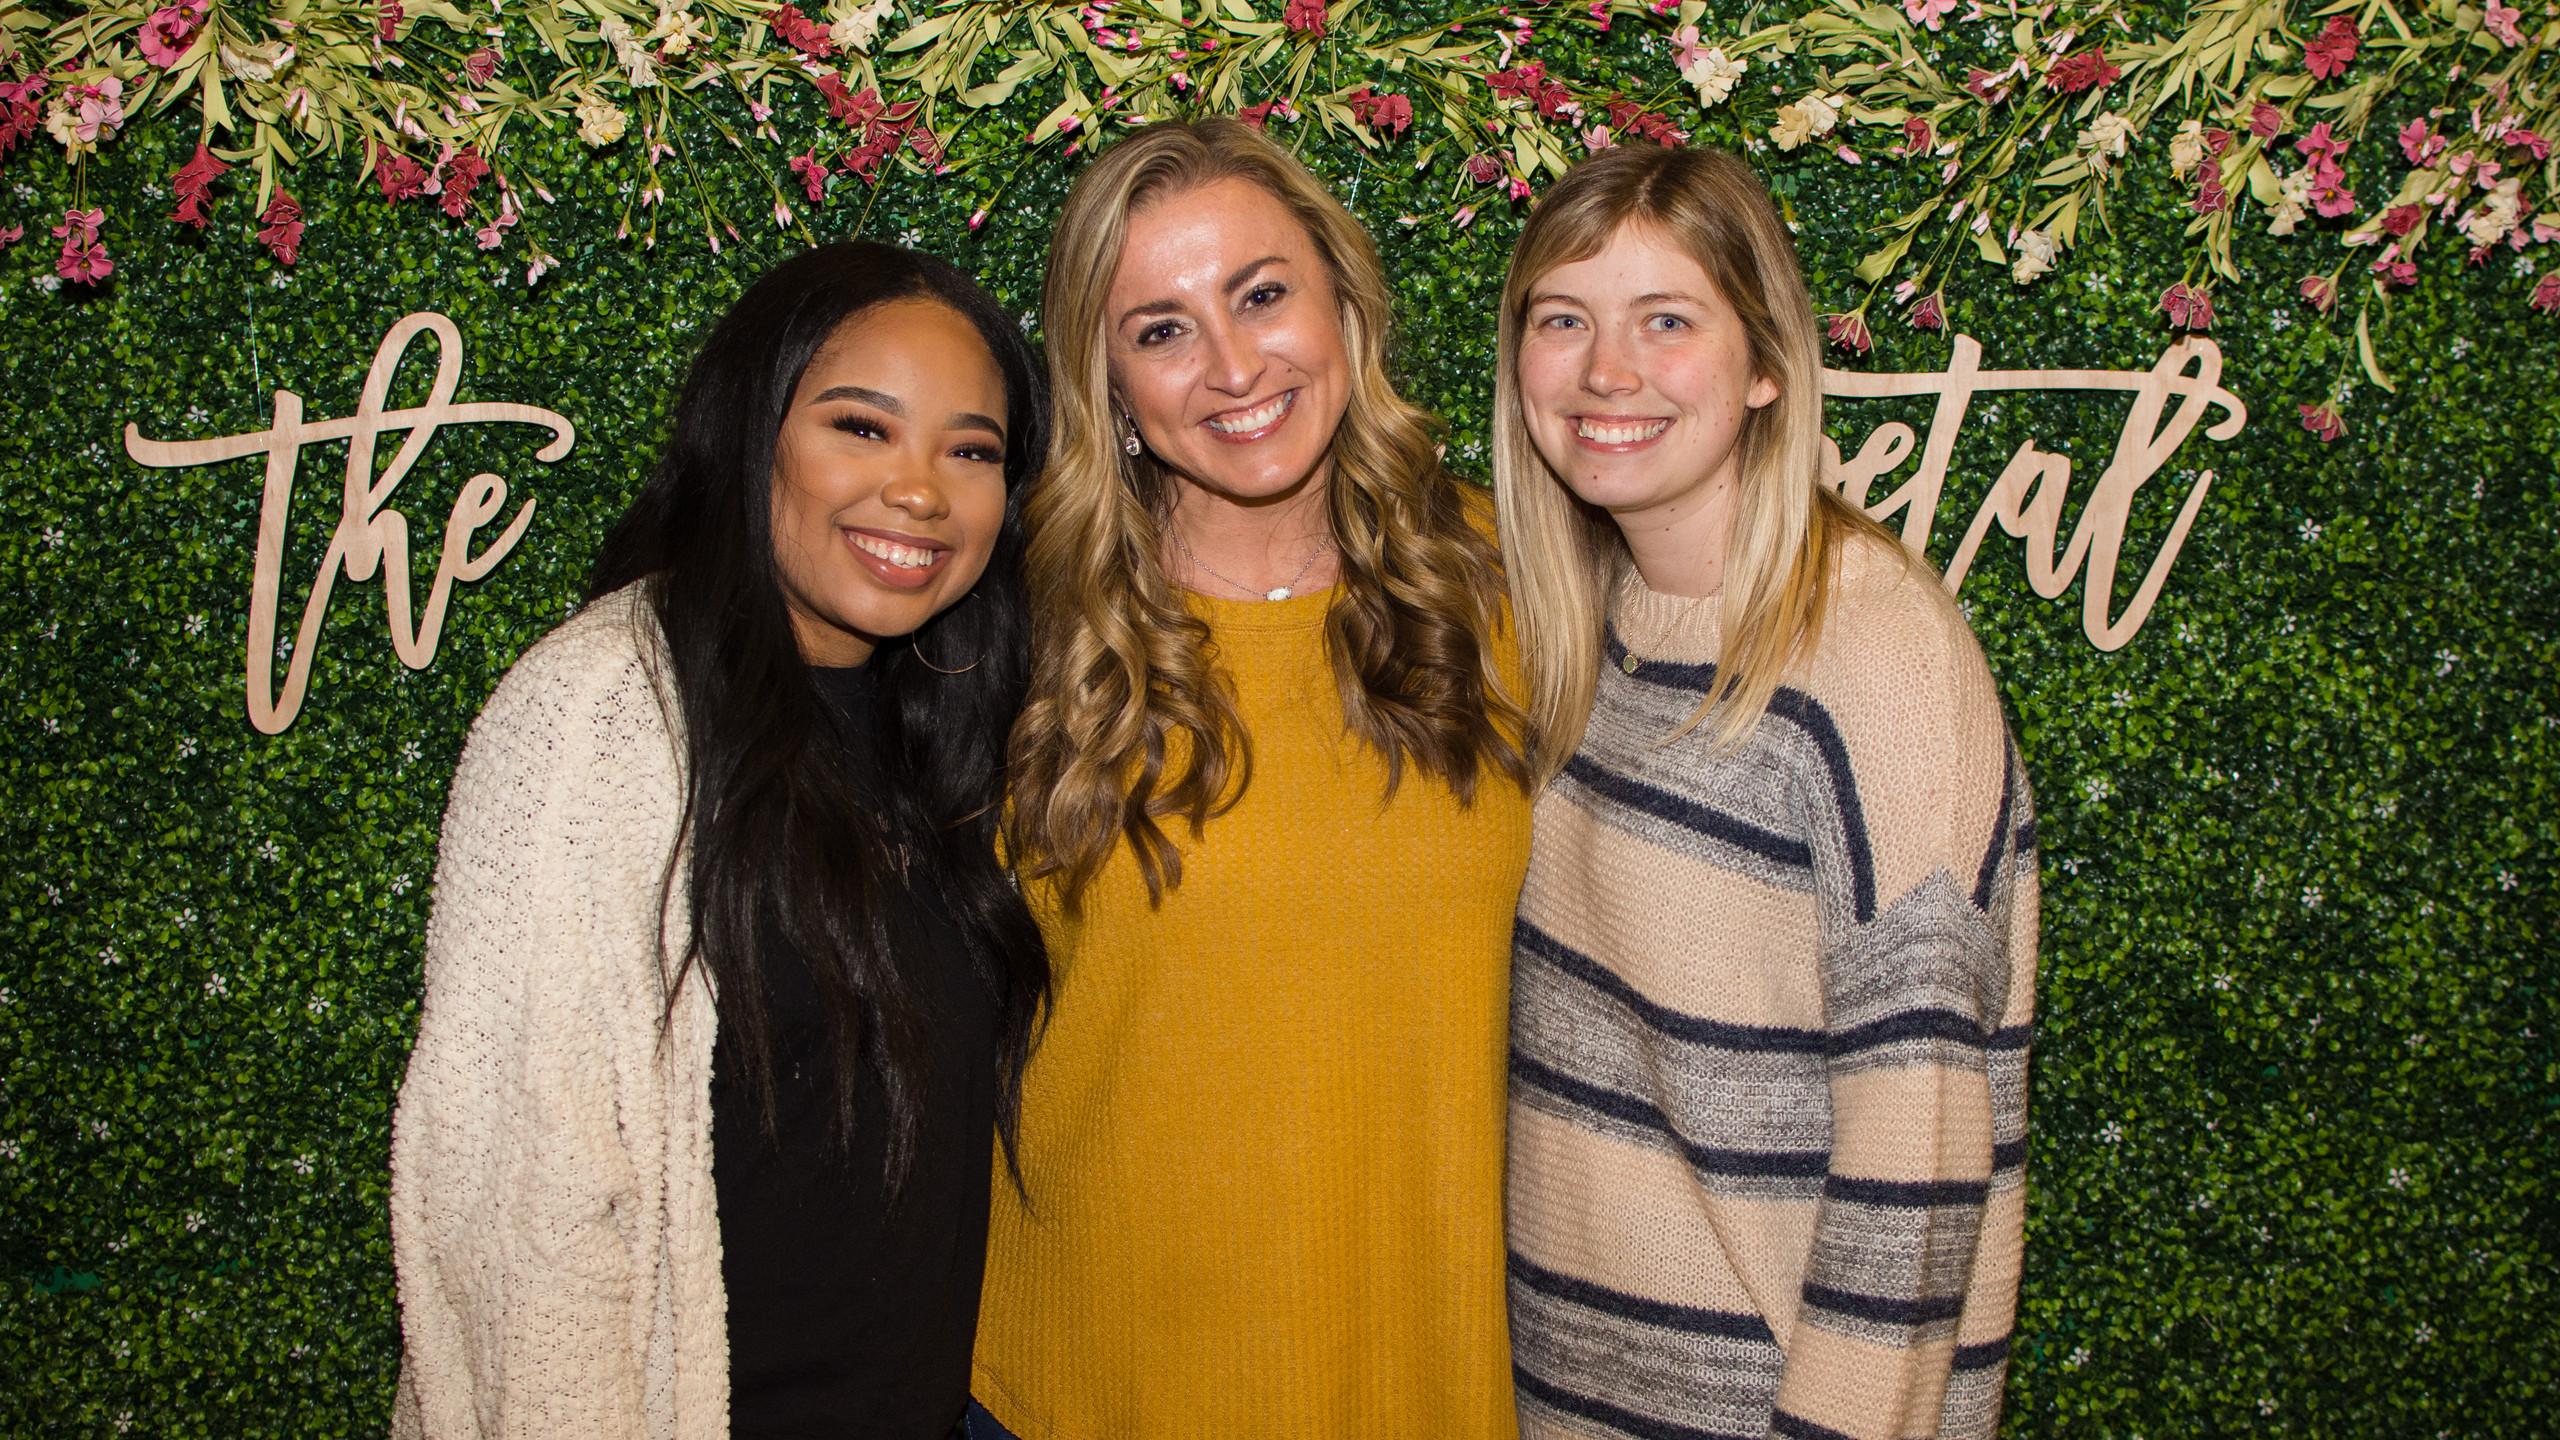 Olivia Carter, Danielle Stack, and Megan